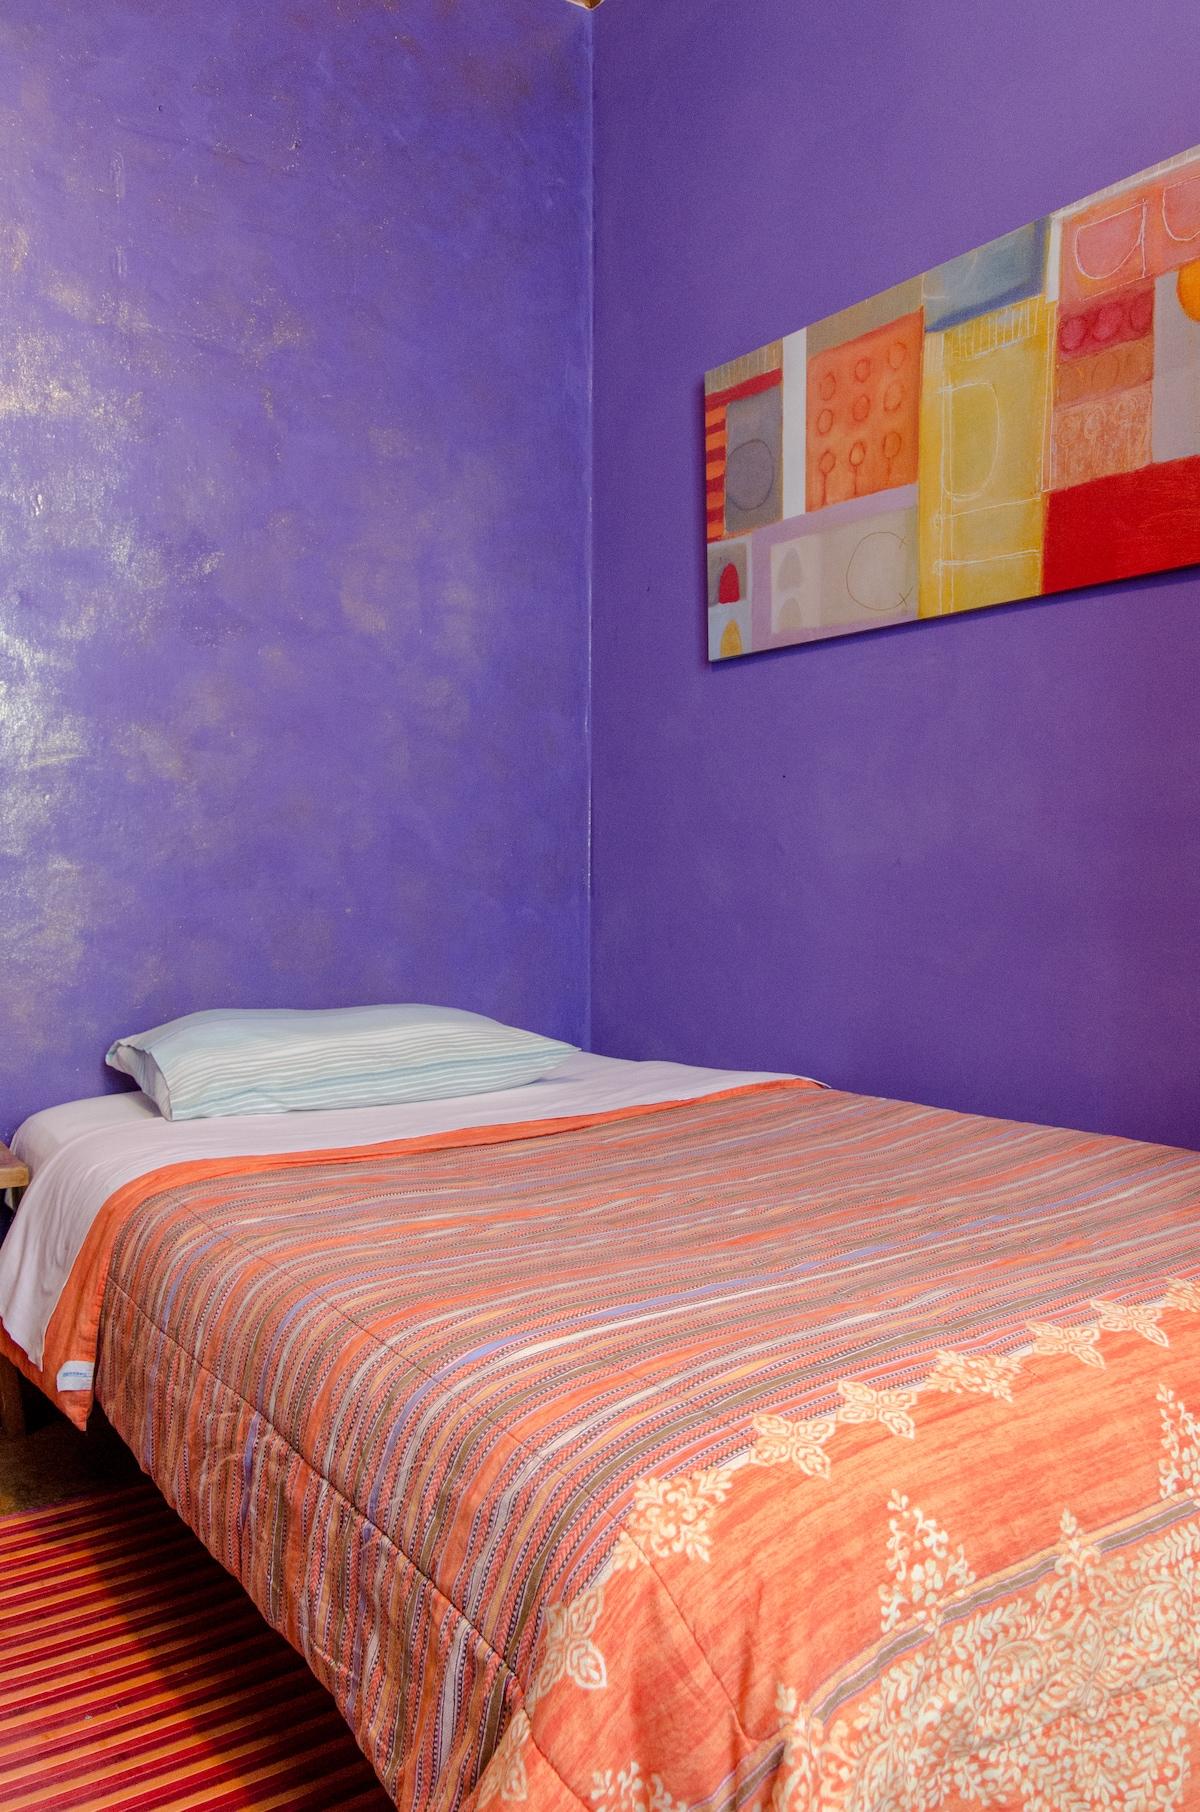 Cheap hotel in centre of Frerrara